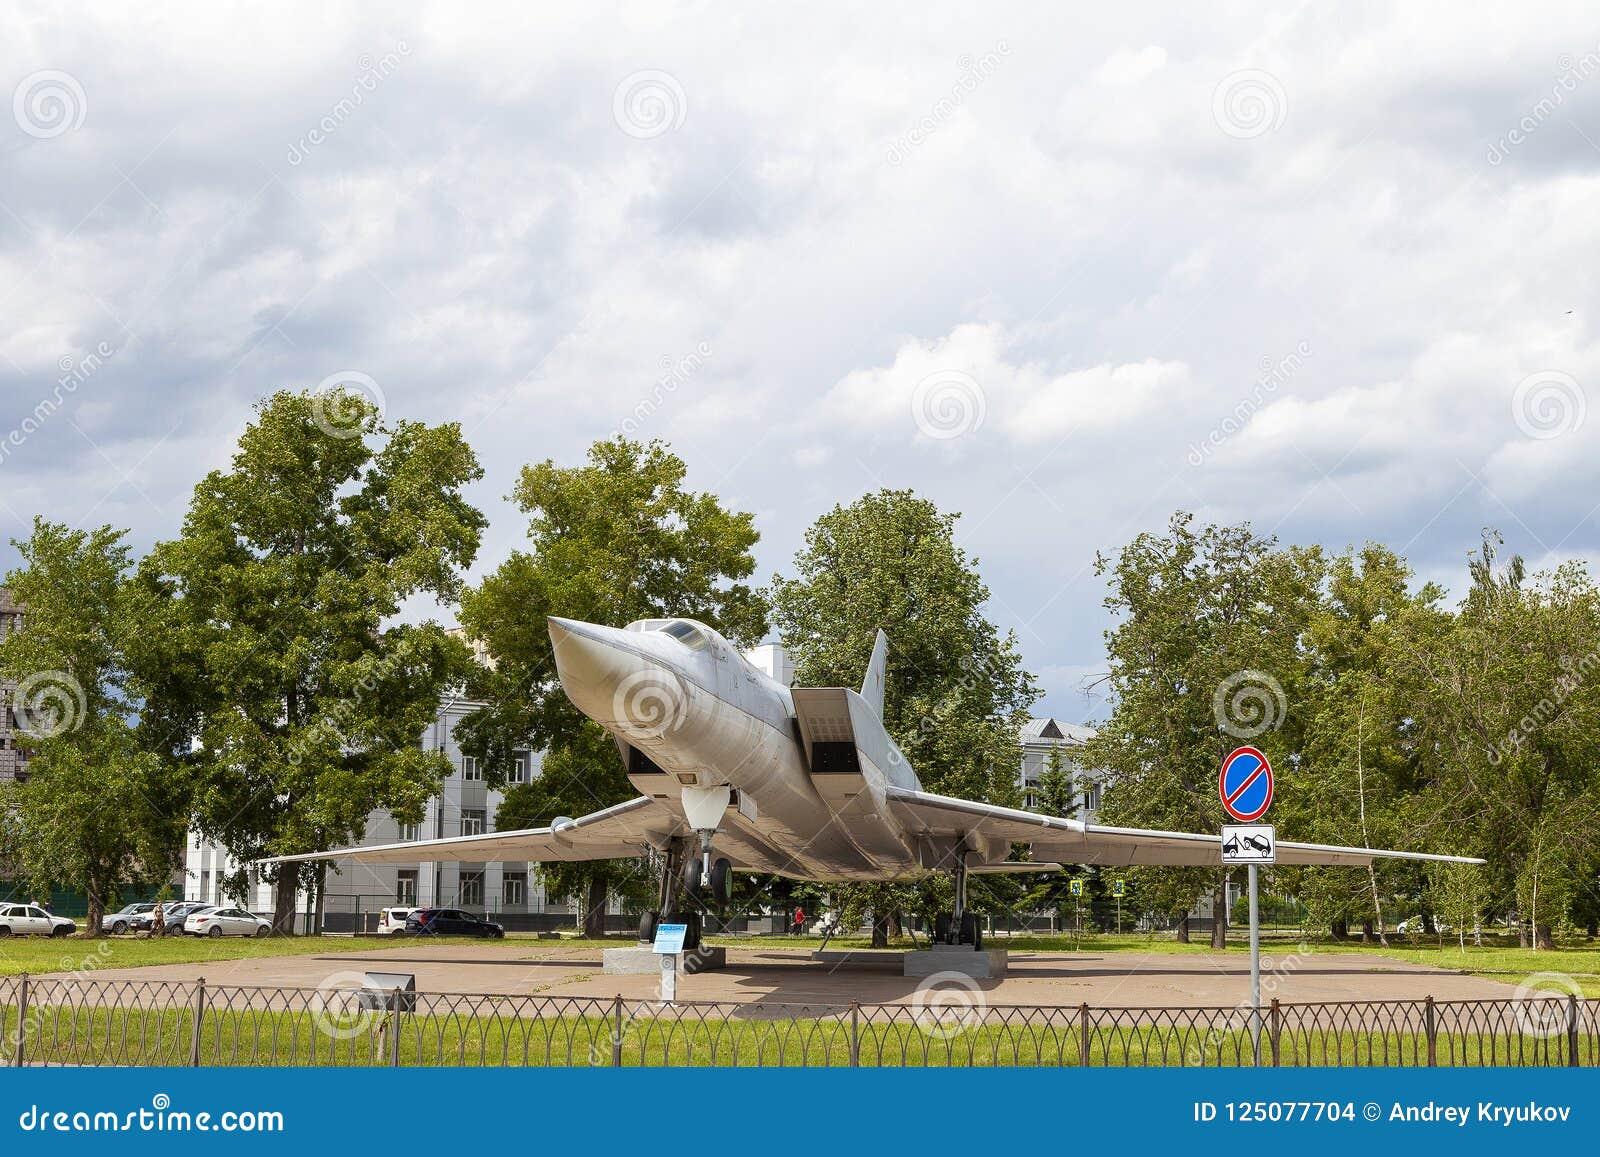 KASAN, RUSSLAND, AM 5. JUNI 2018: Das Flächemonument TU-22M3